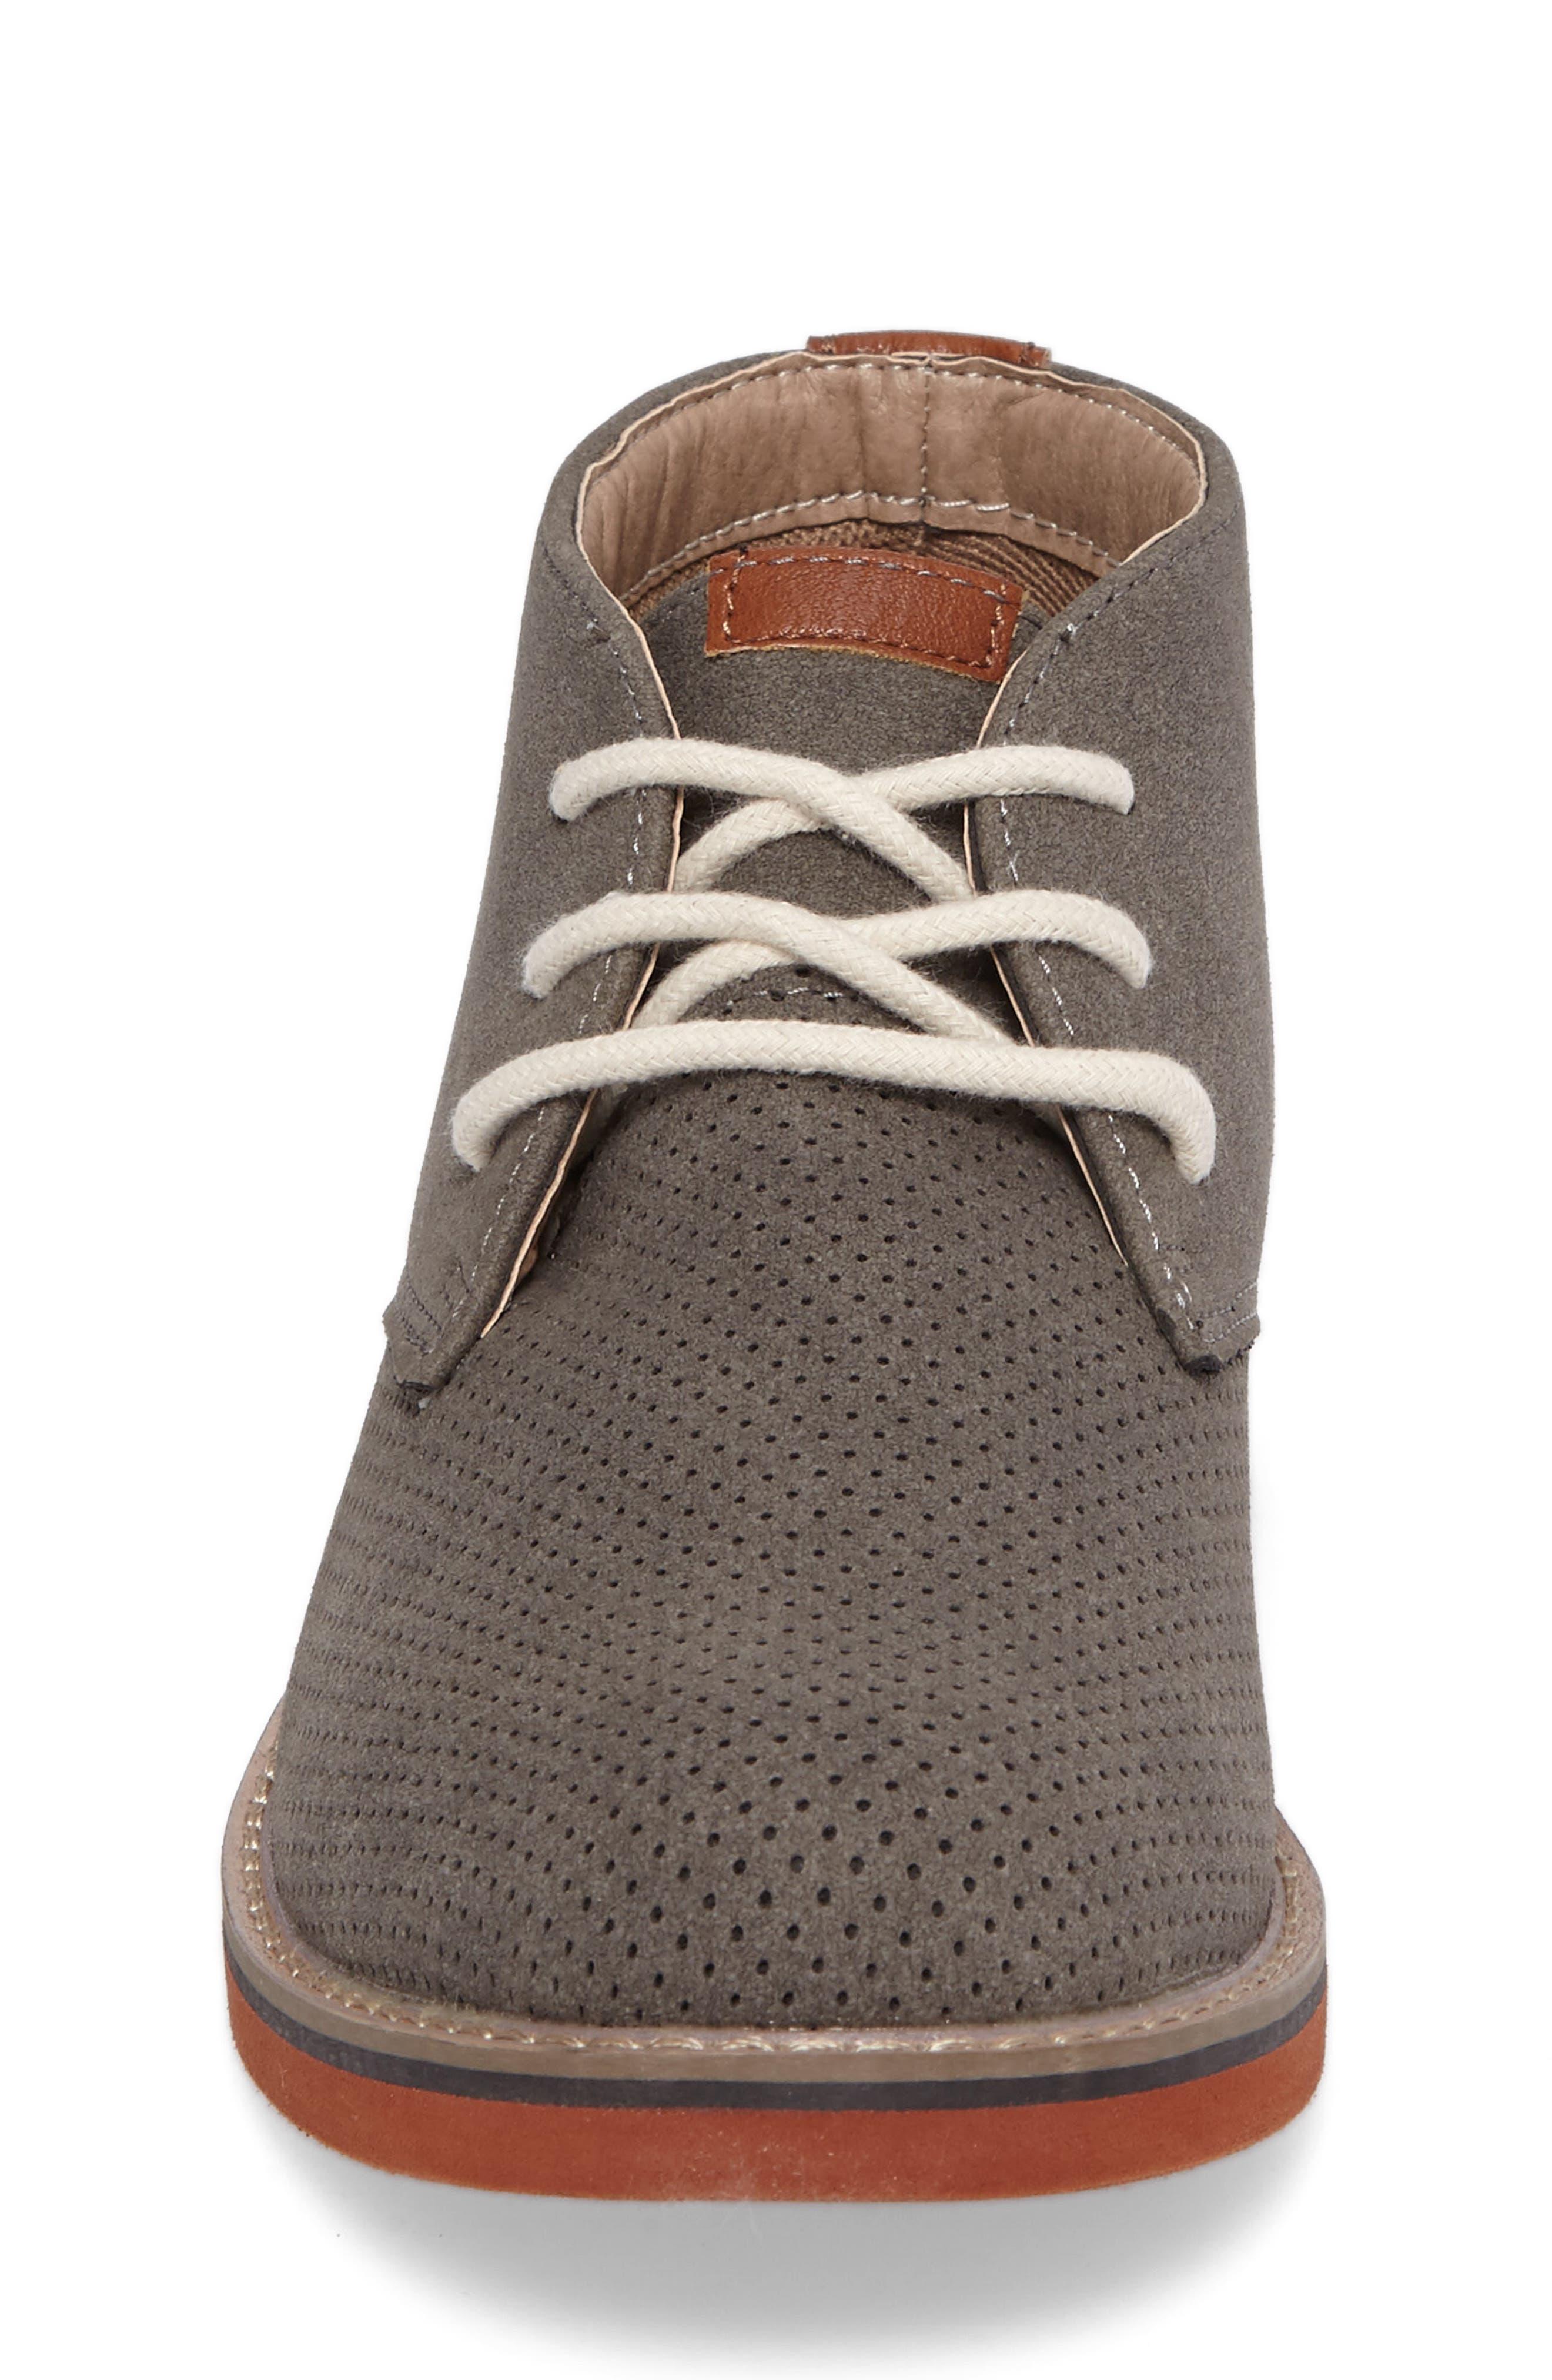 Baden Perforated Chukka Shoe,                             Alternate thumbnail 4, color,                             055